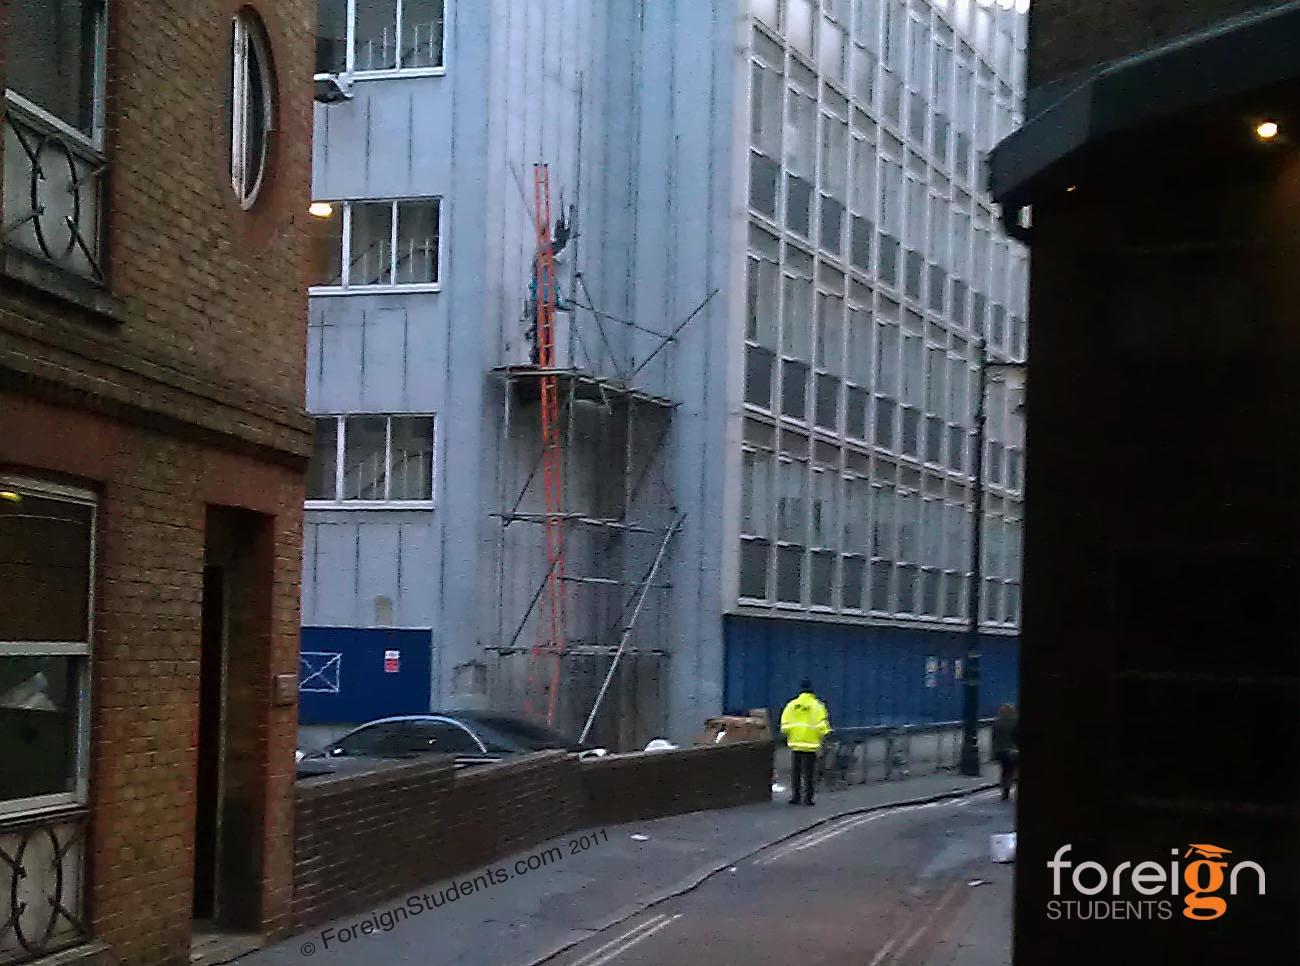 Scaffolding being taken down